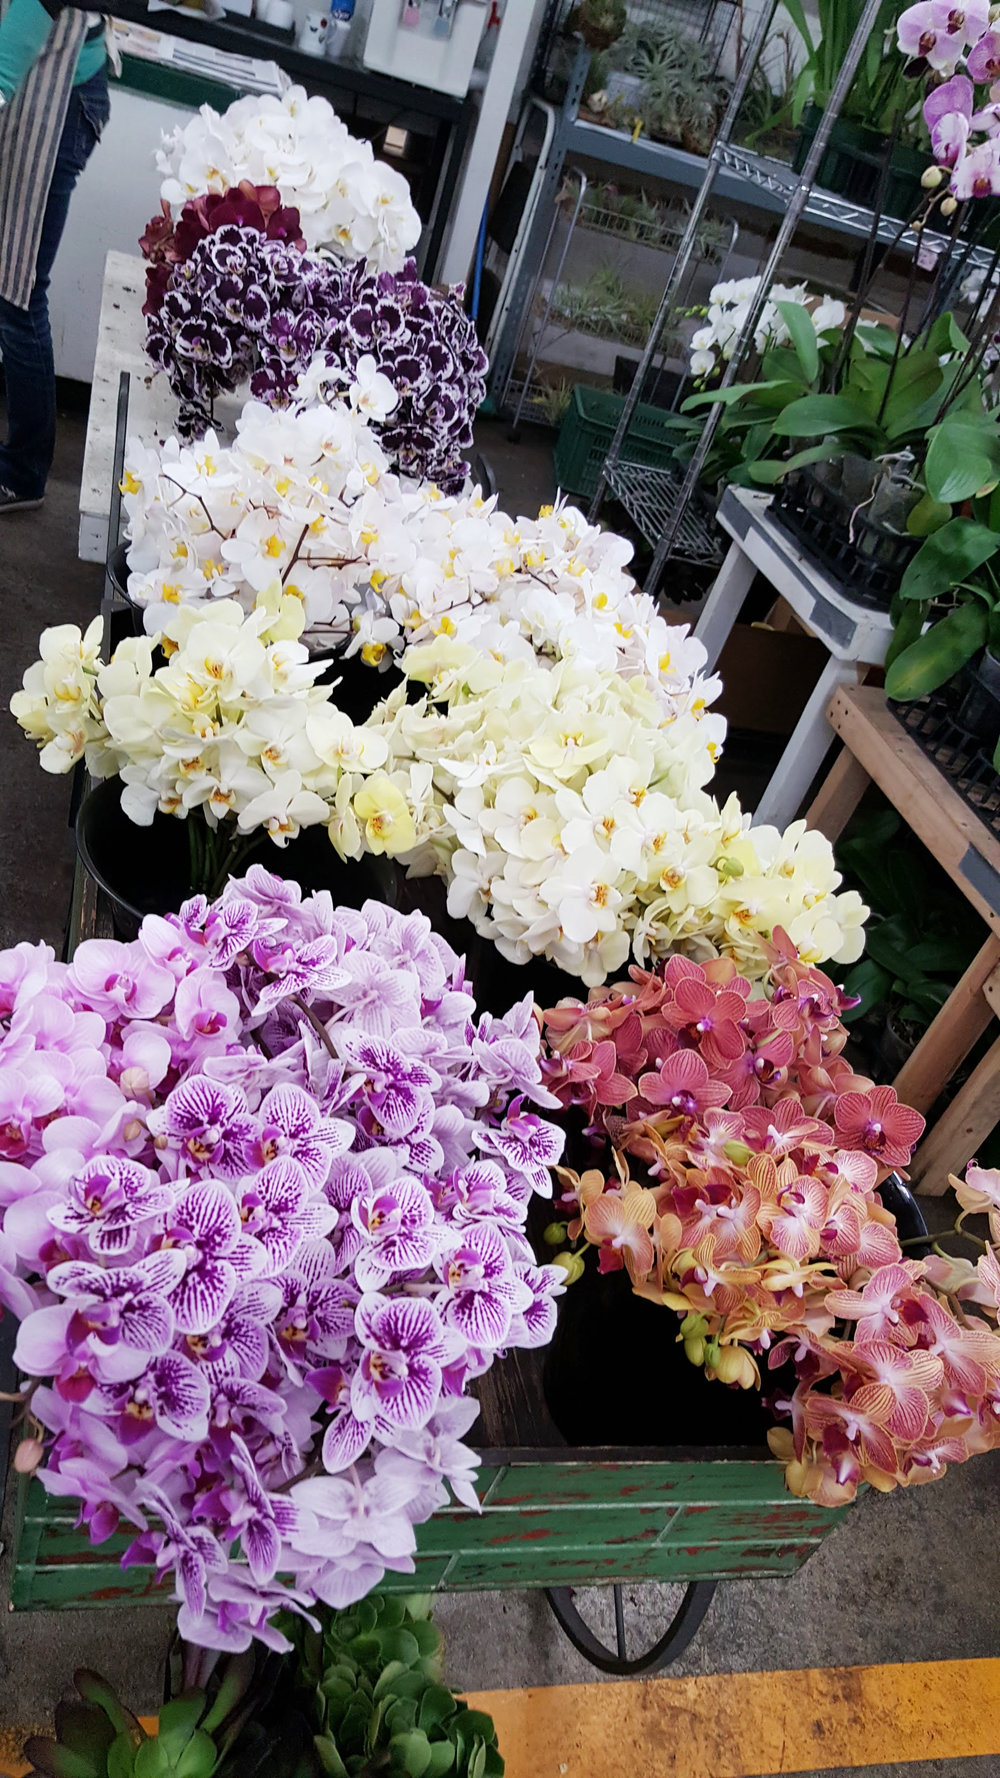 maui-wholesale-blooms-orchids.jpg